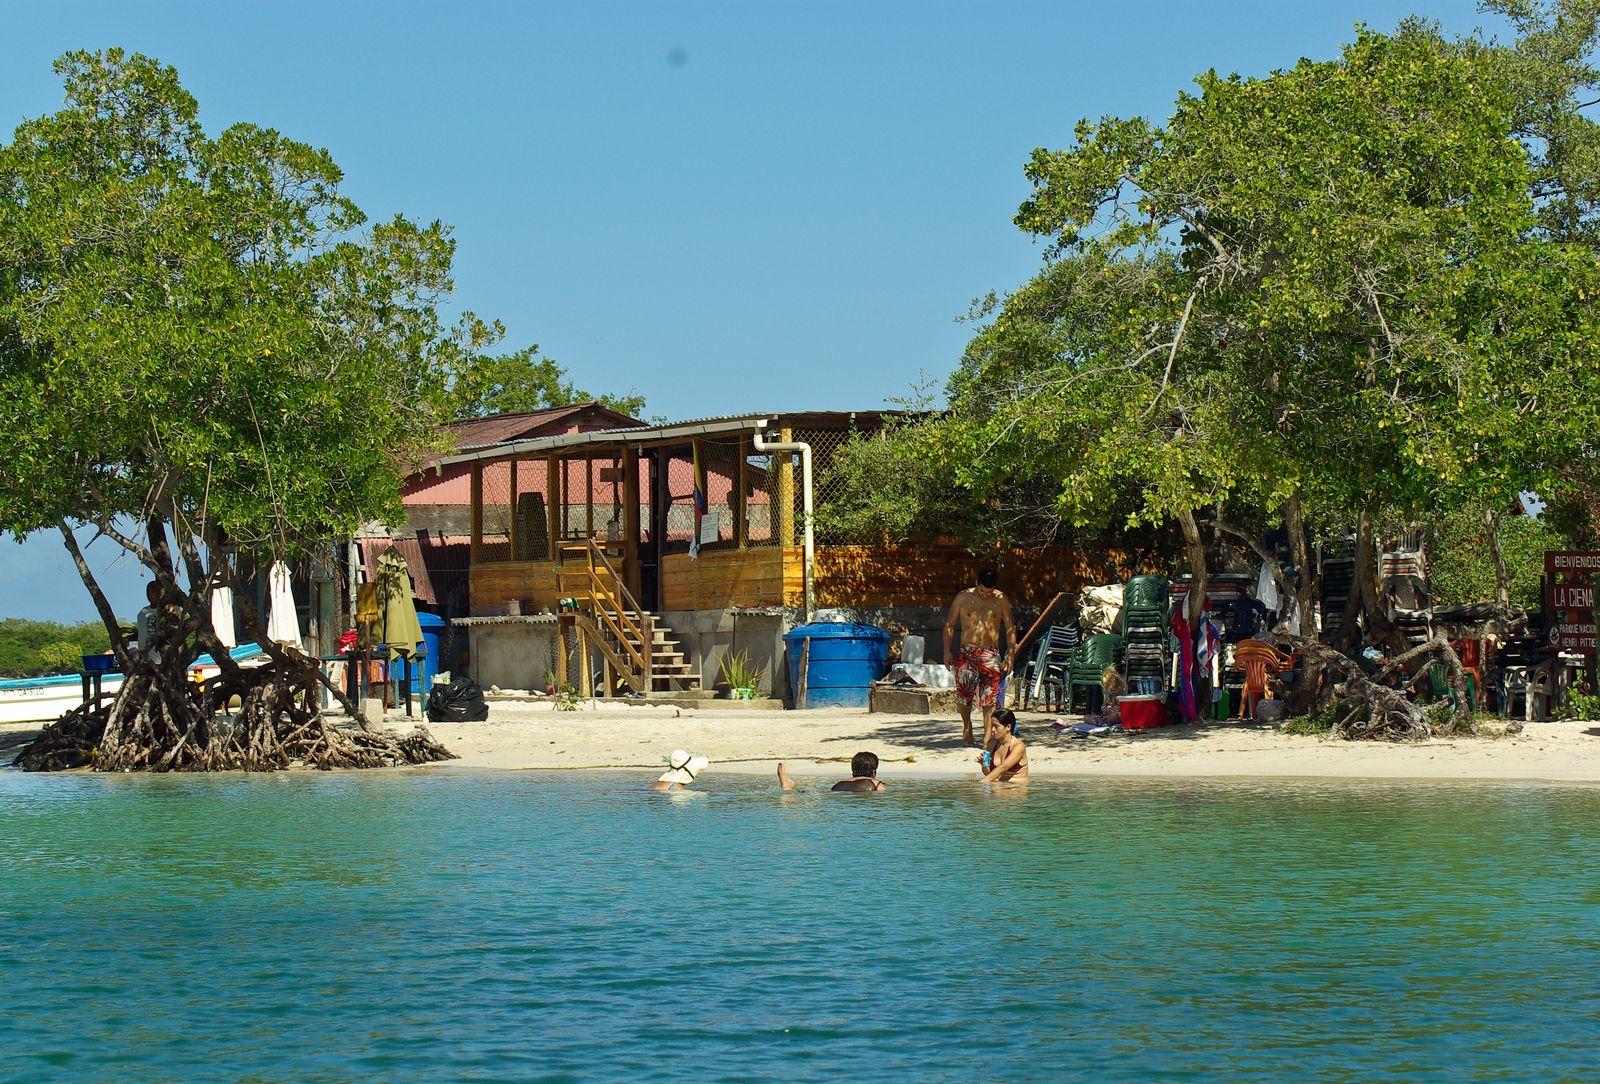 La Cienaga, Карибское Море